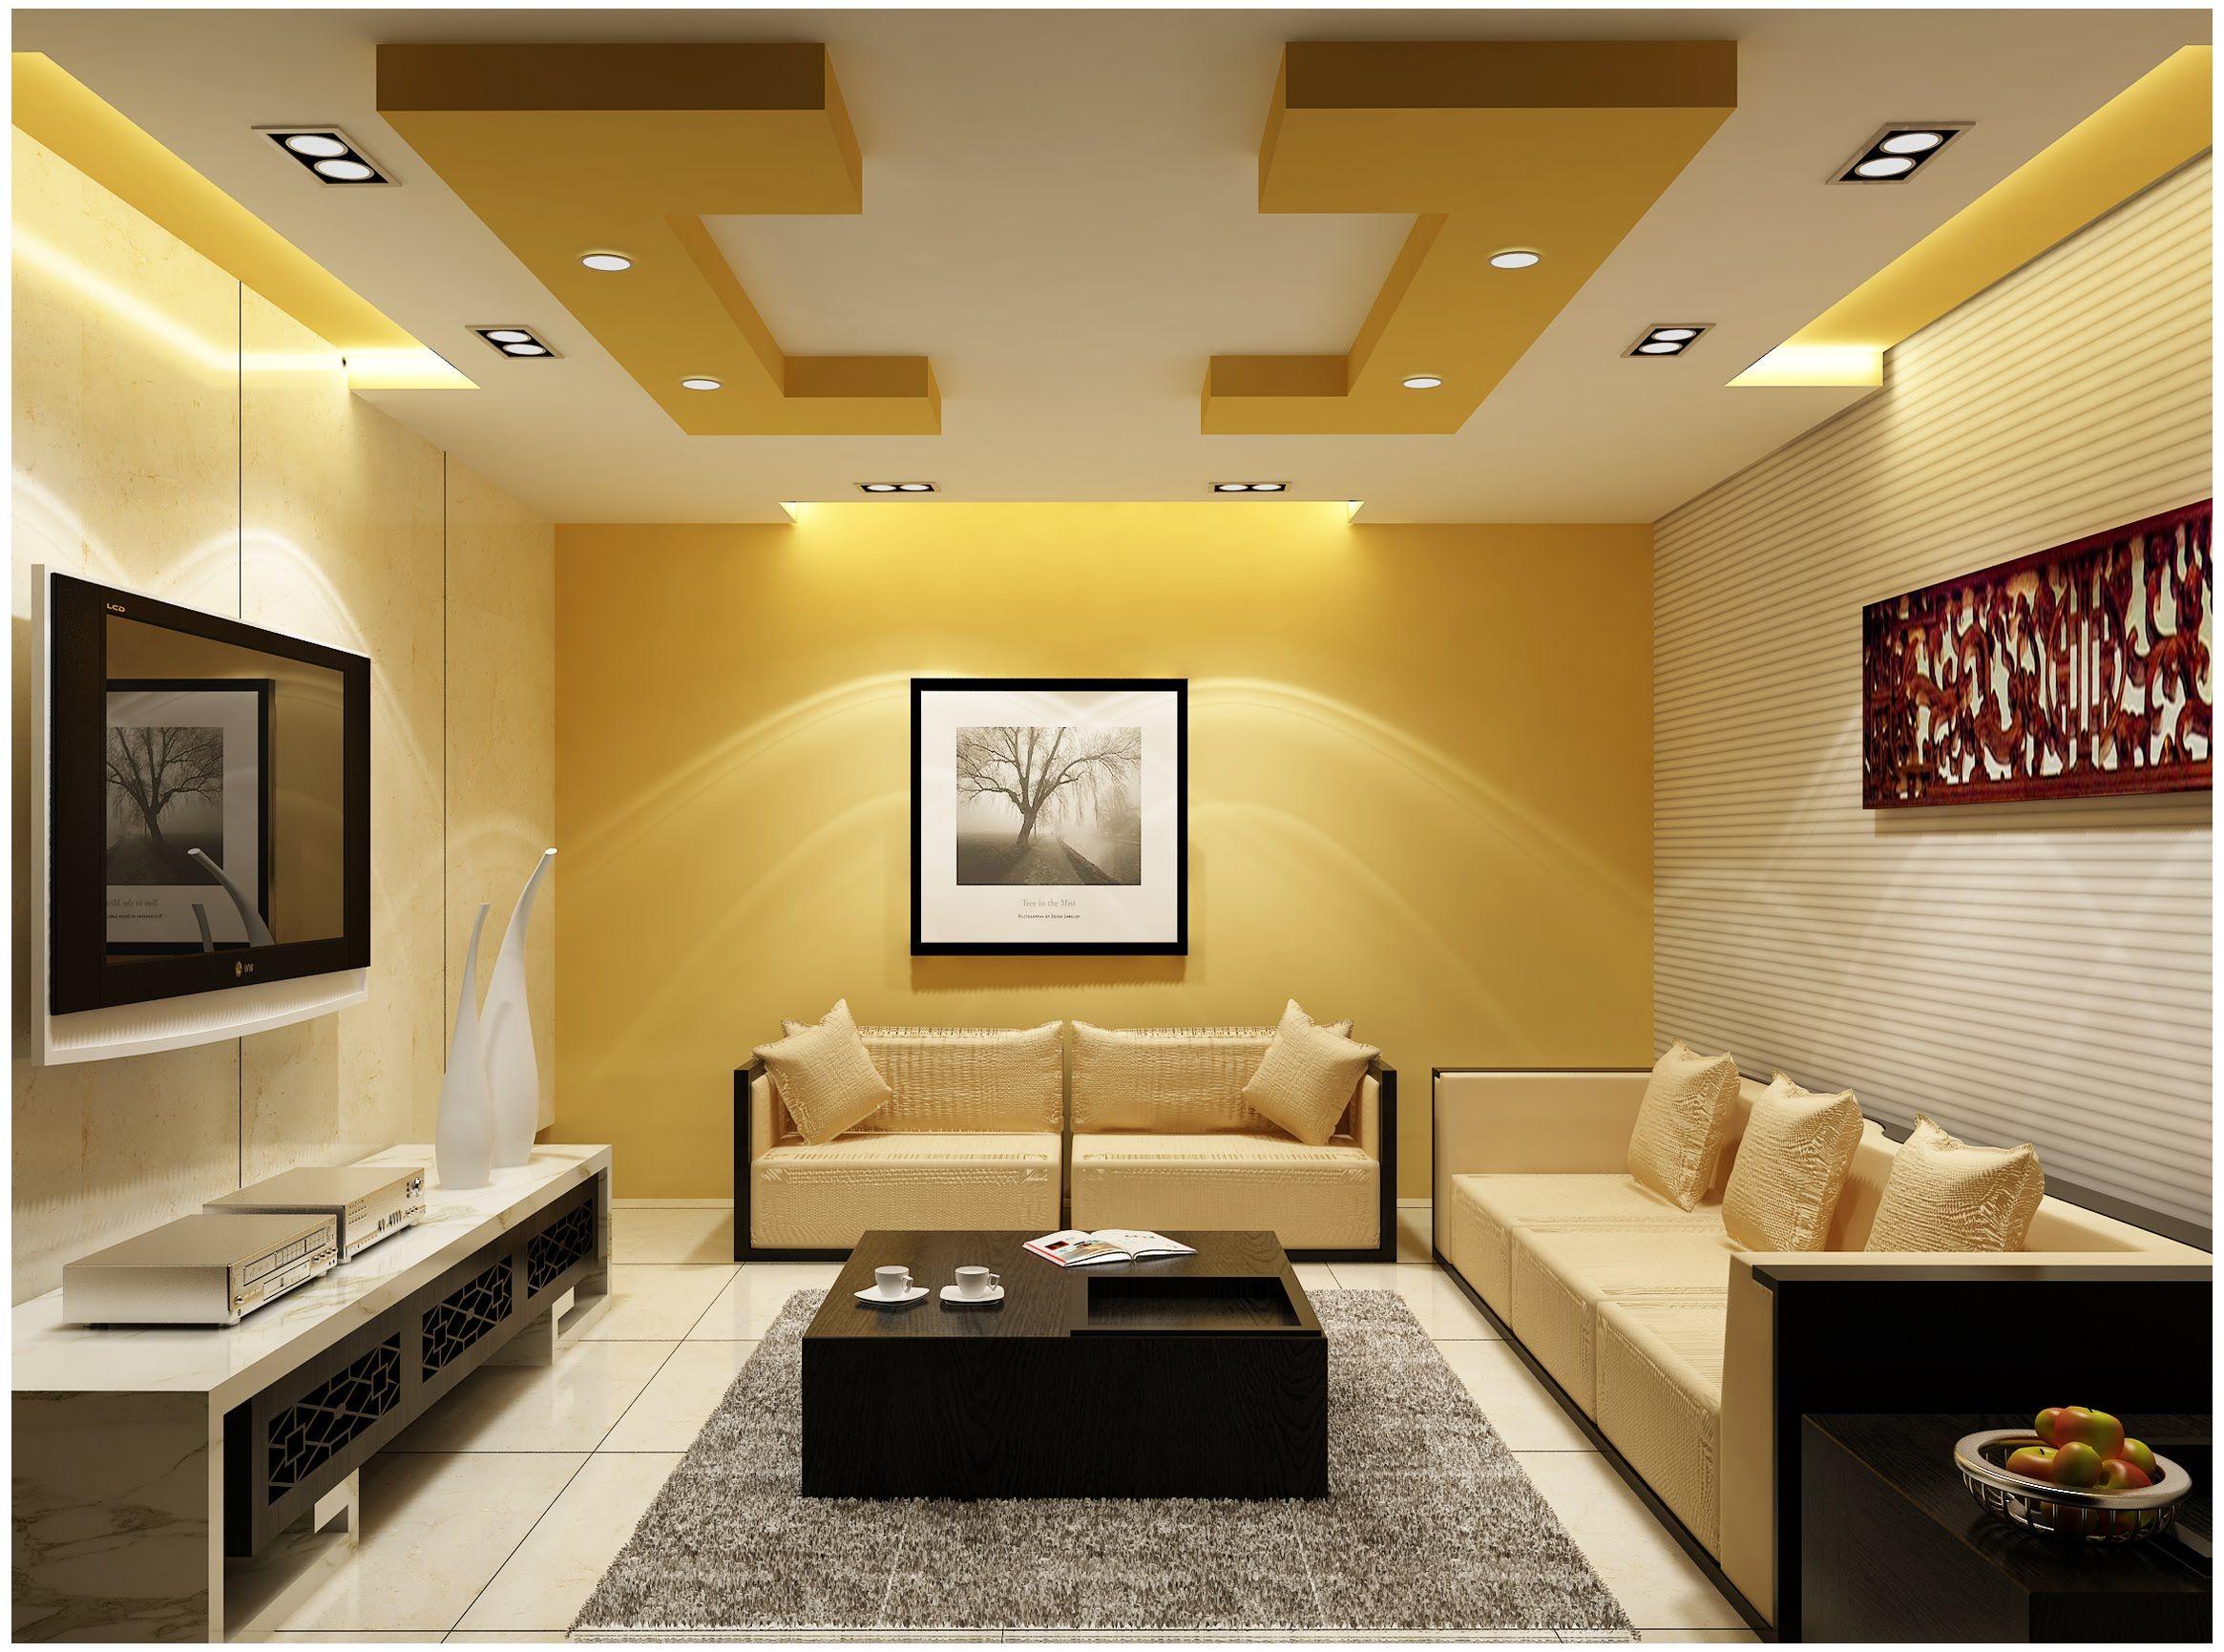 False Ceiling Design Designs For Living Room And Ceiling Design